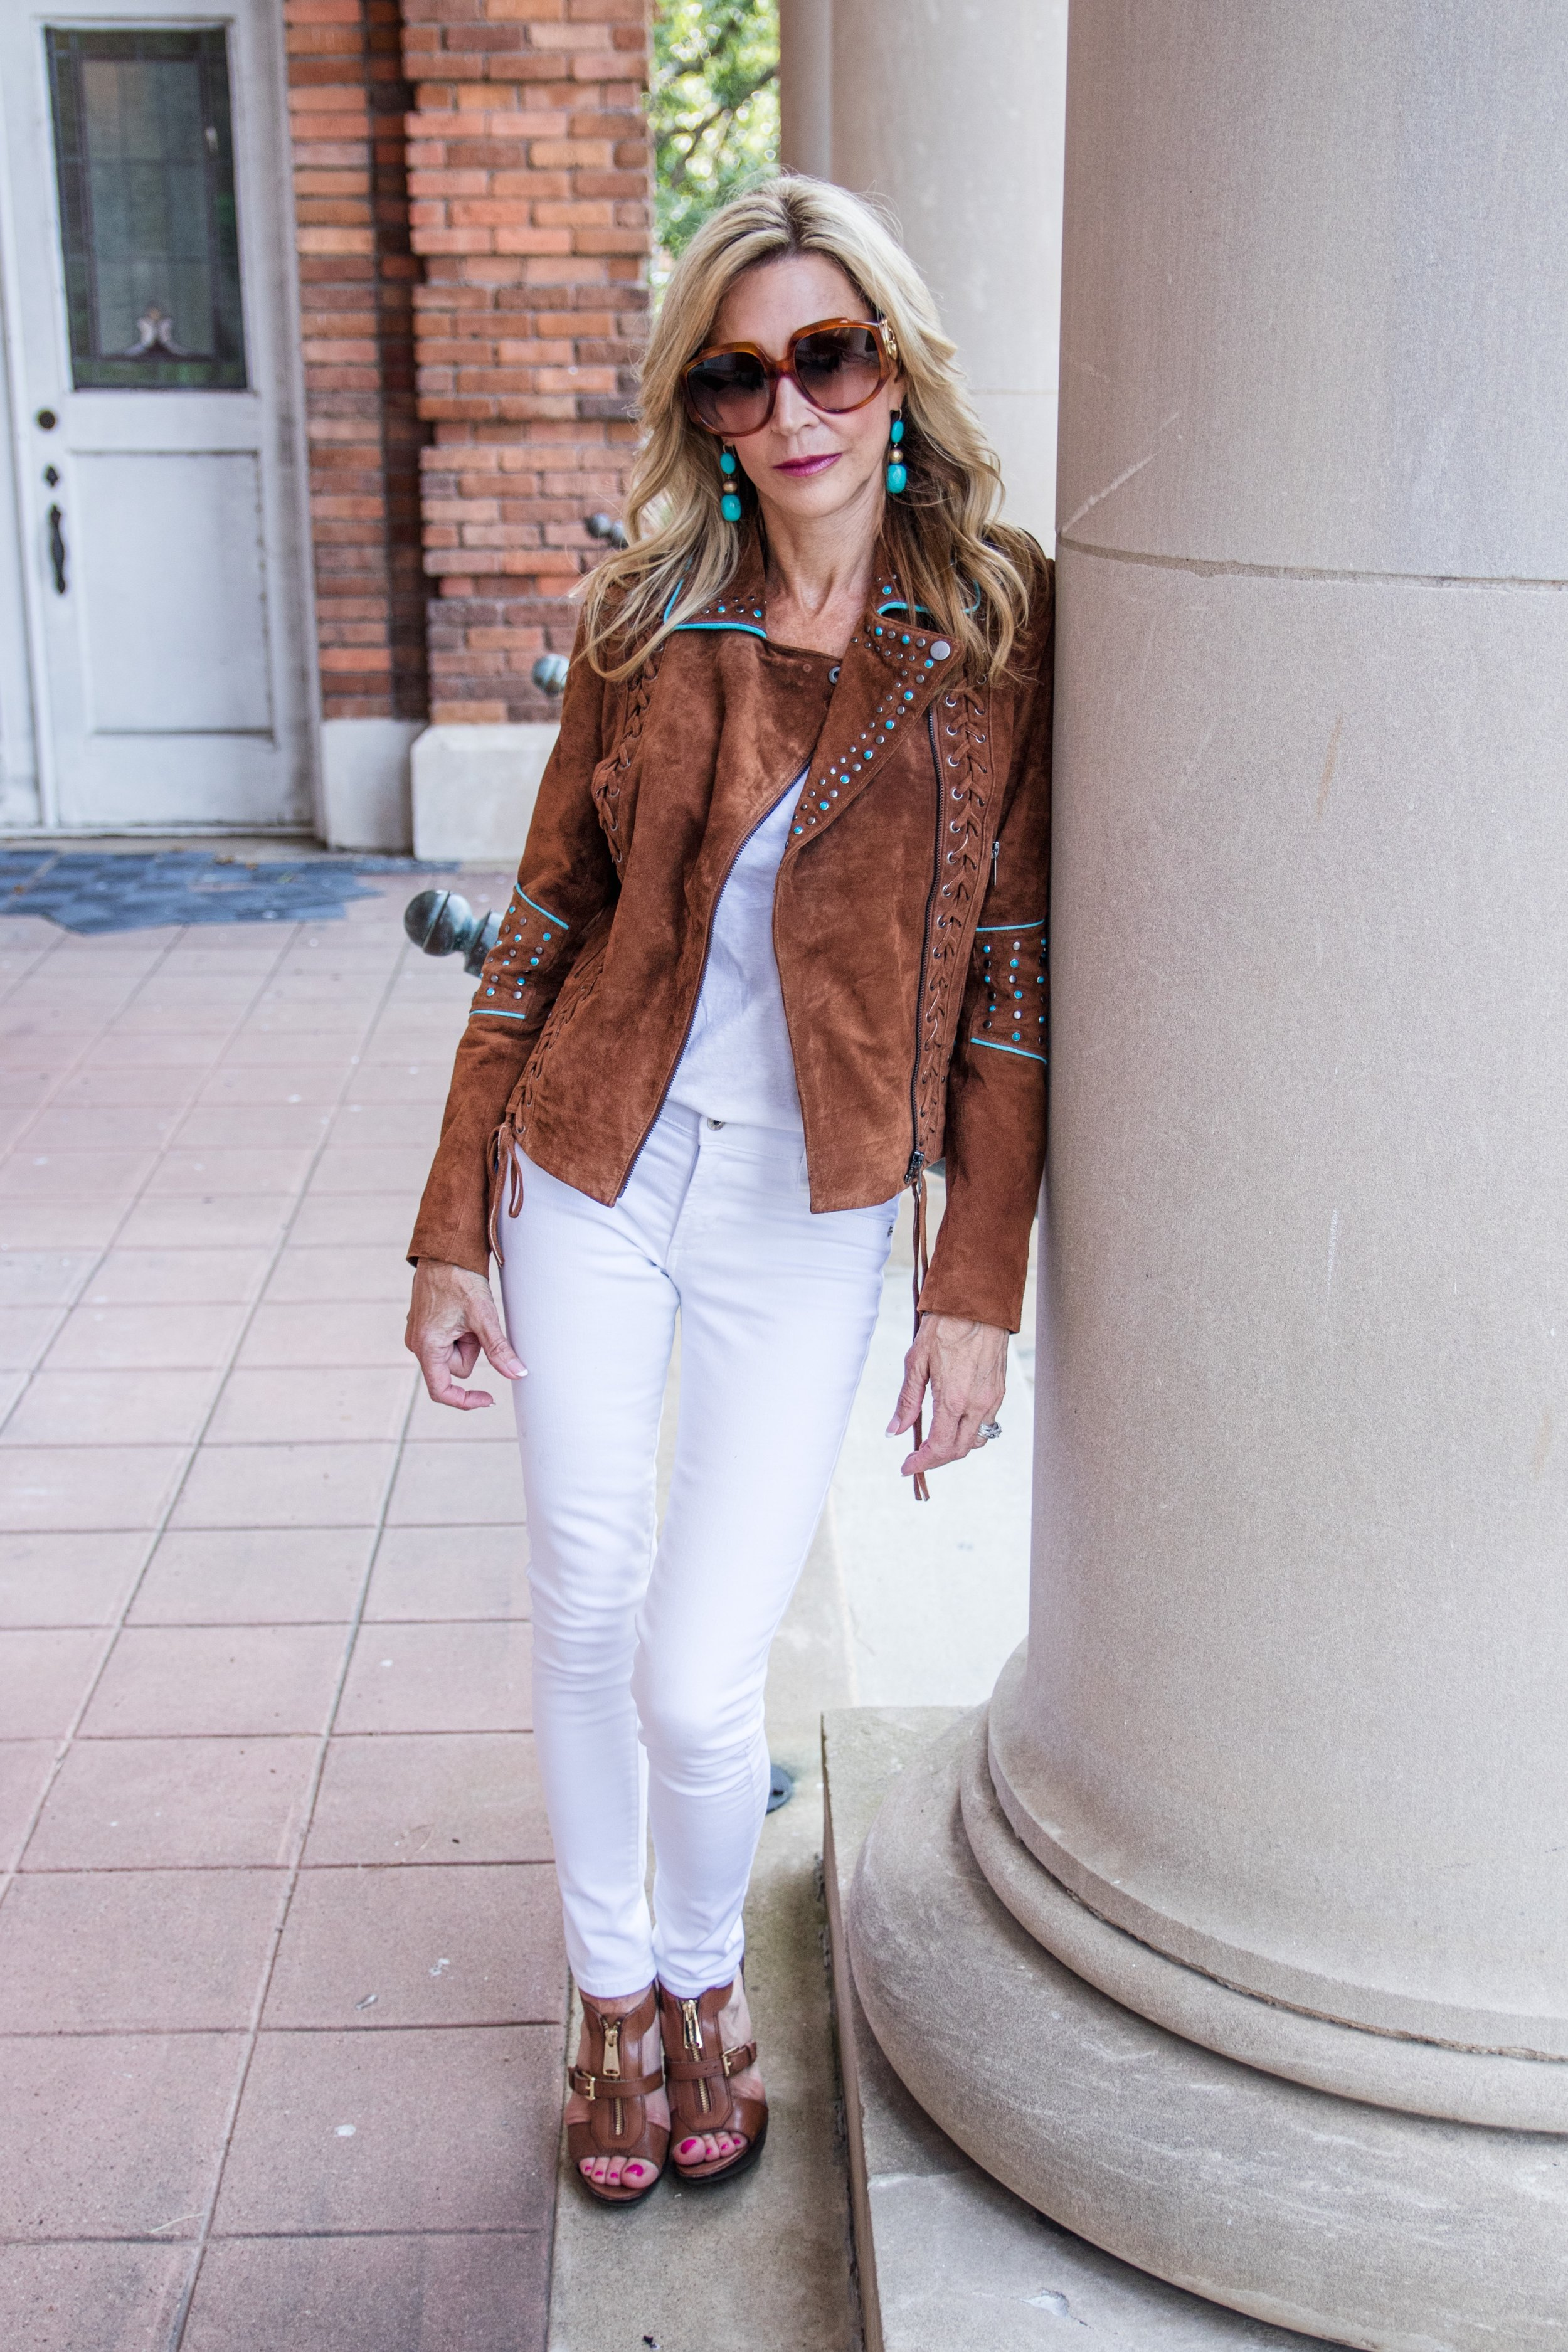 Boston Proper Suede Jacket - Crazy Blonde Life